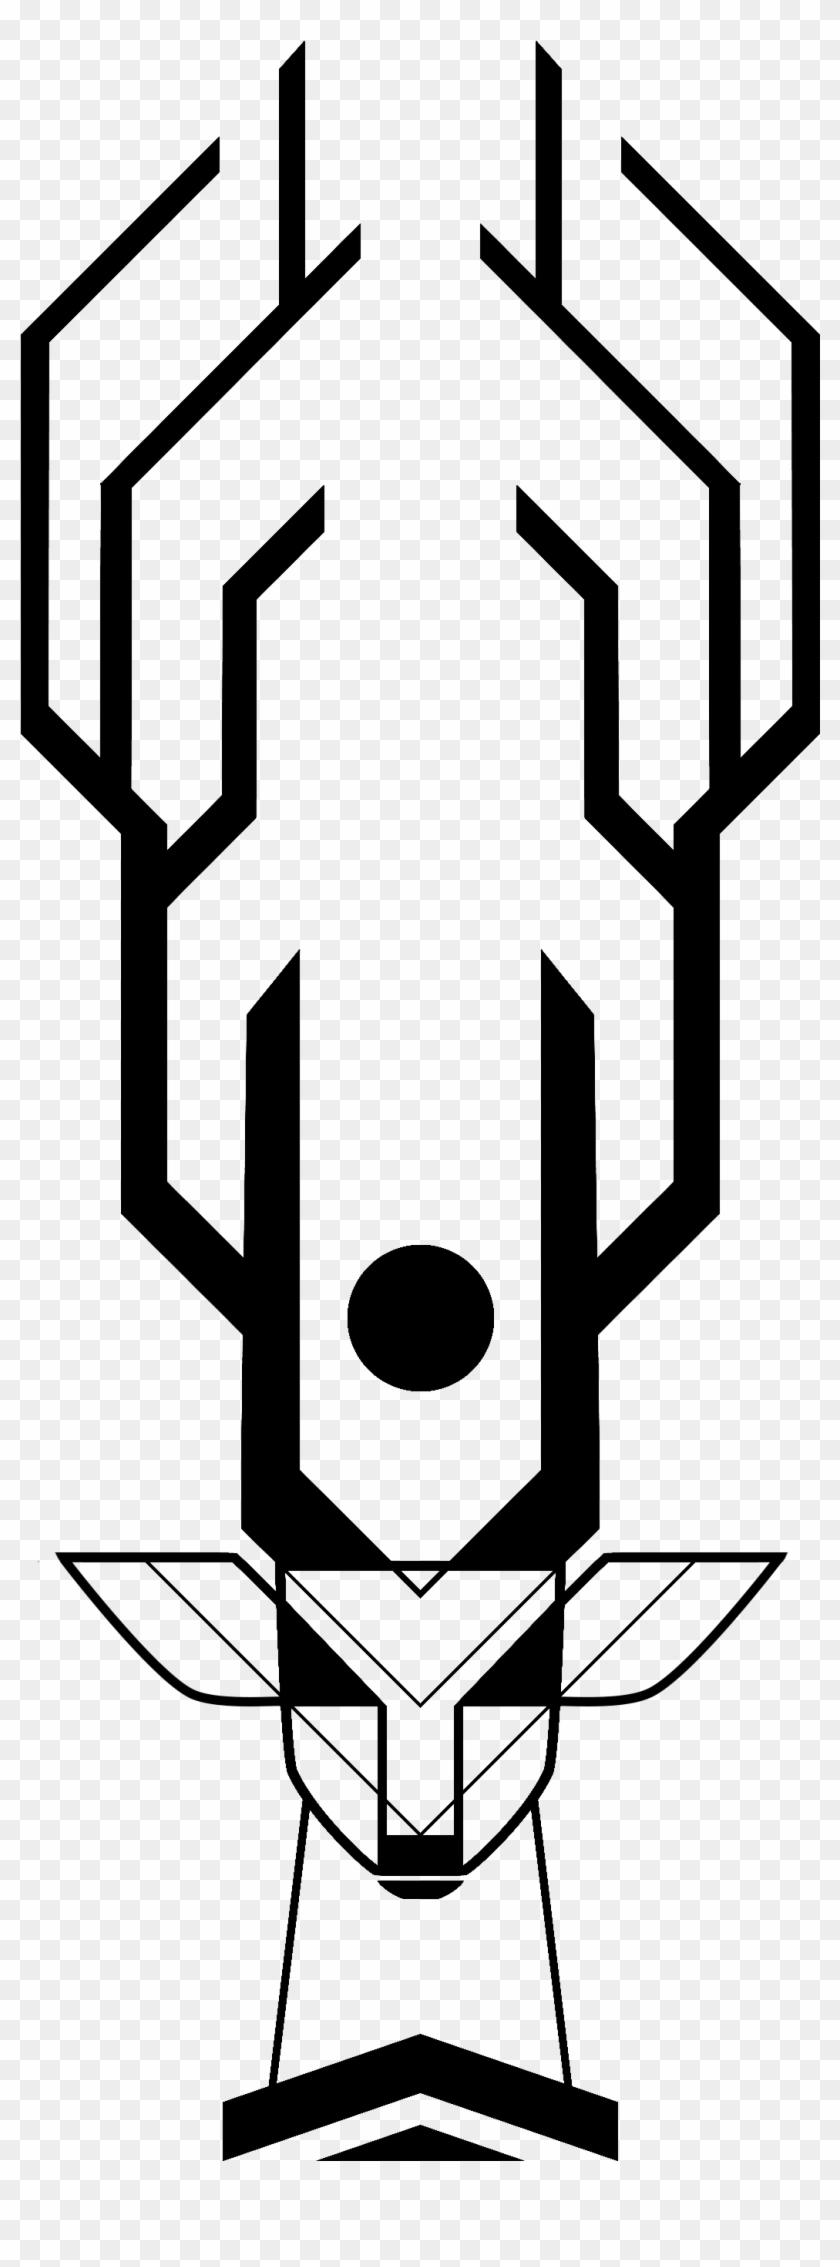 Deer Skull Crest - Tattoo Veado E Pássaros #720167